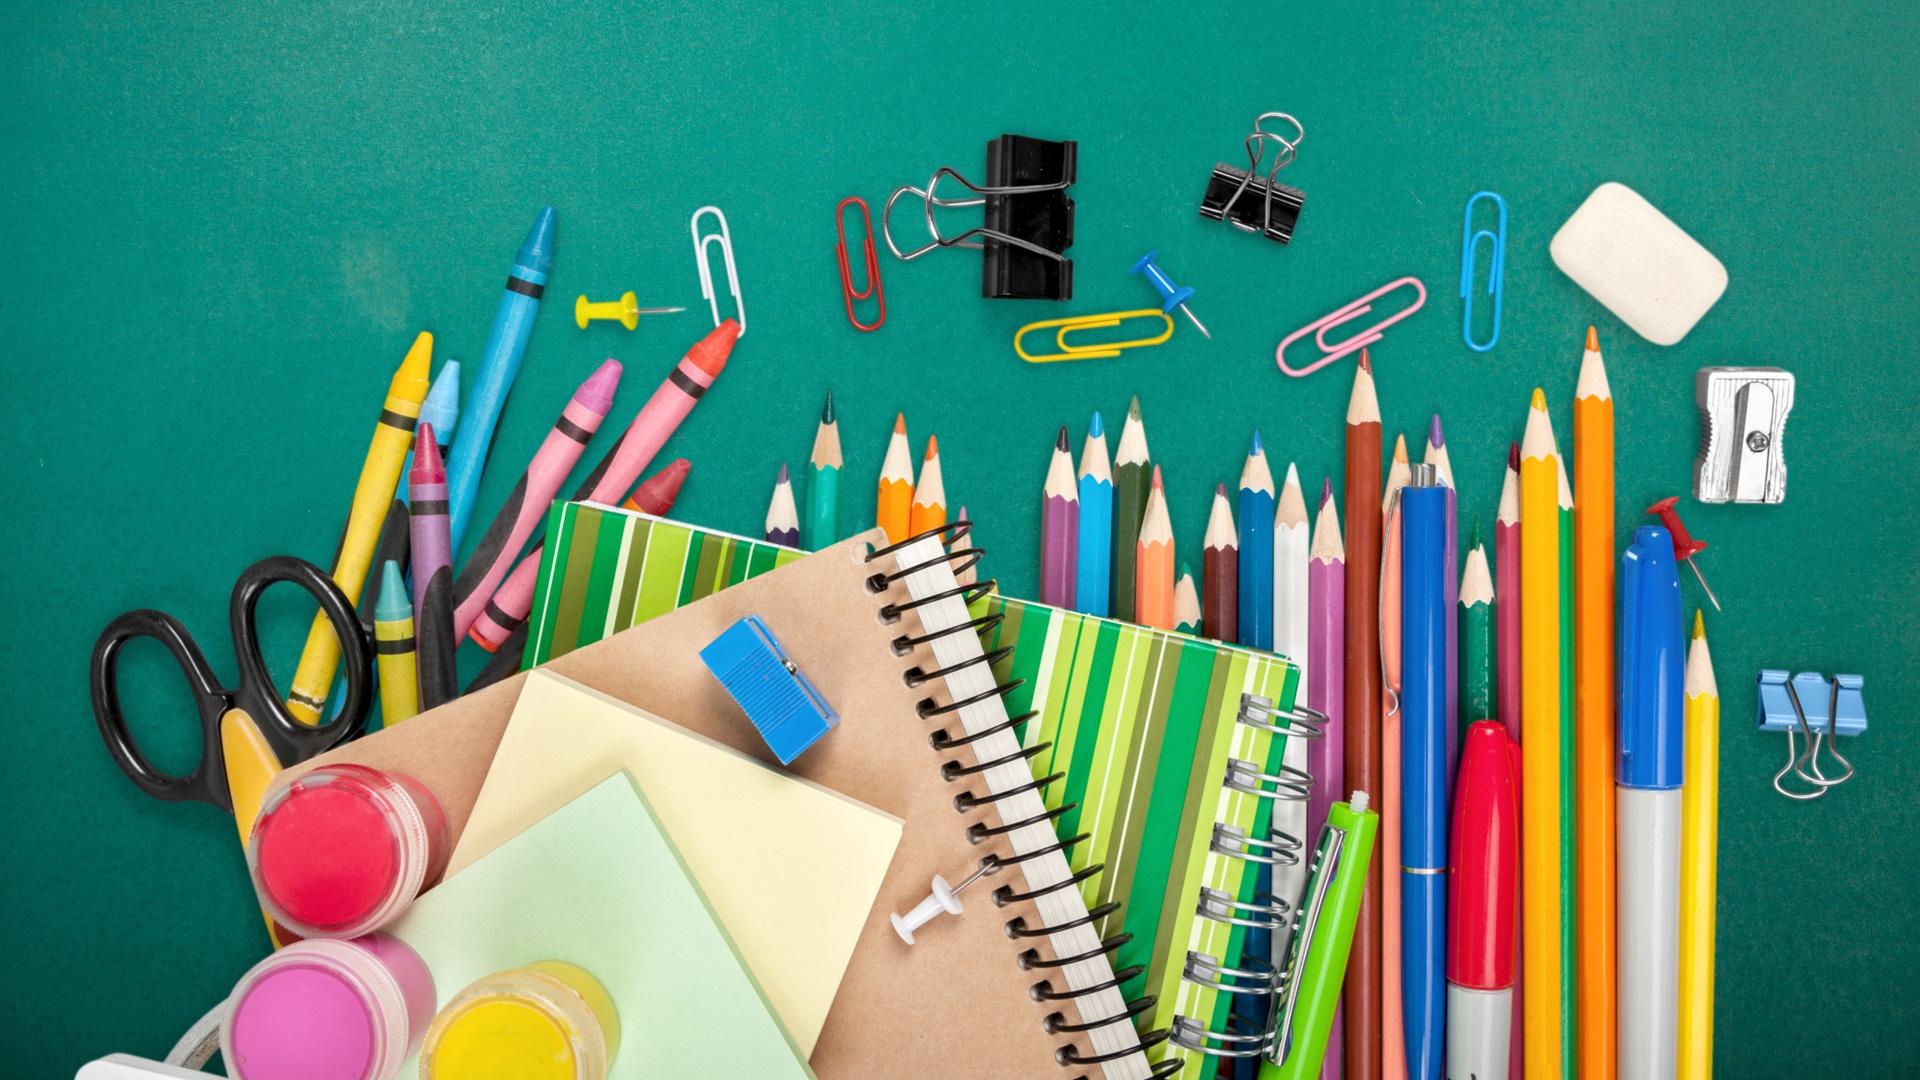 Education wallpaper image hd